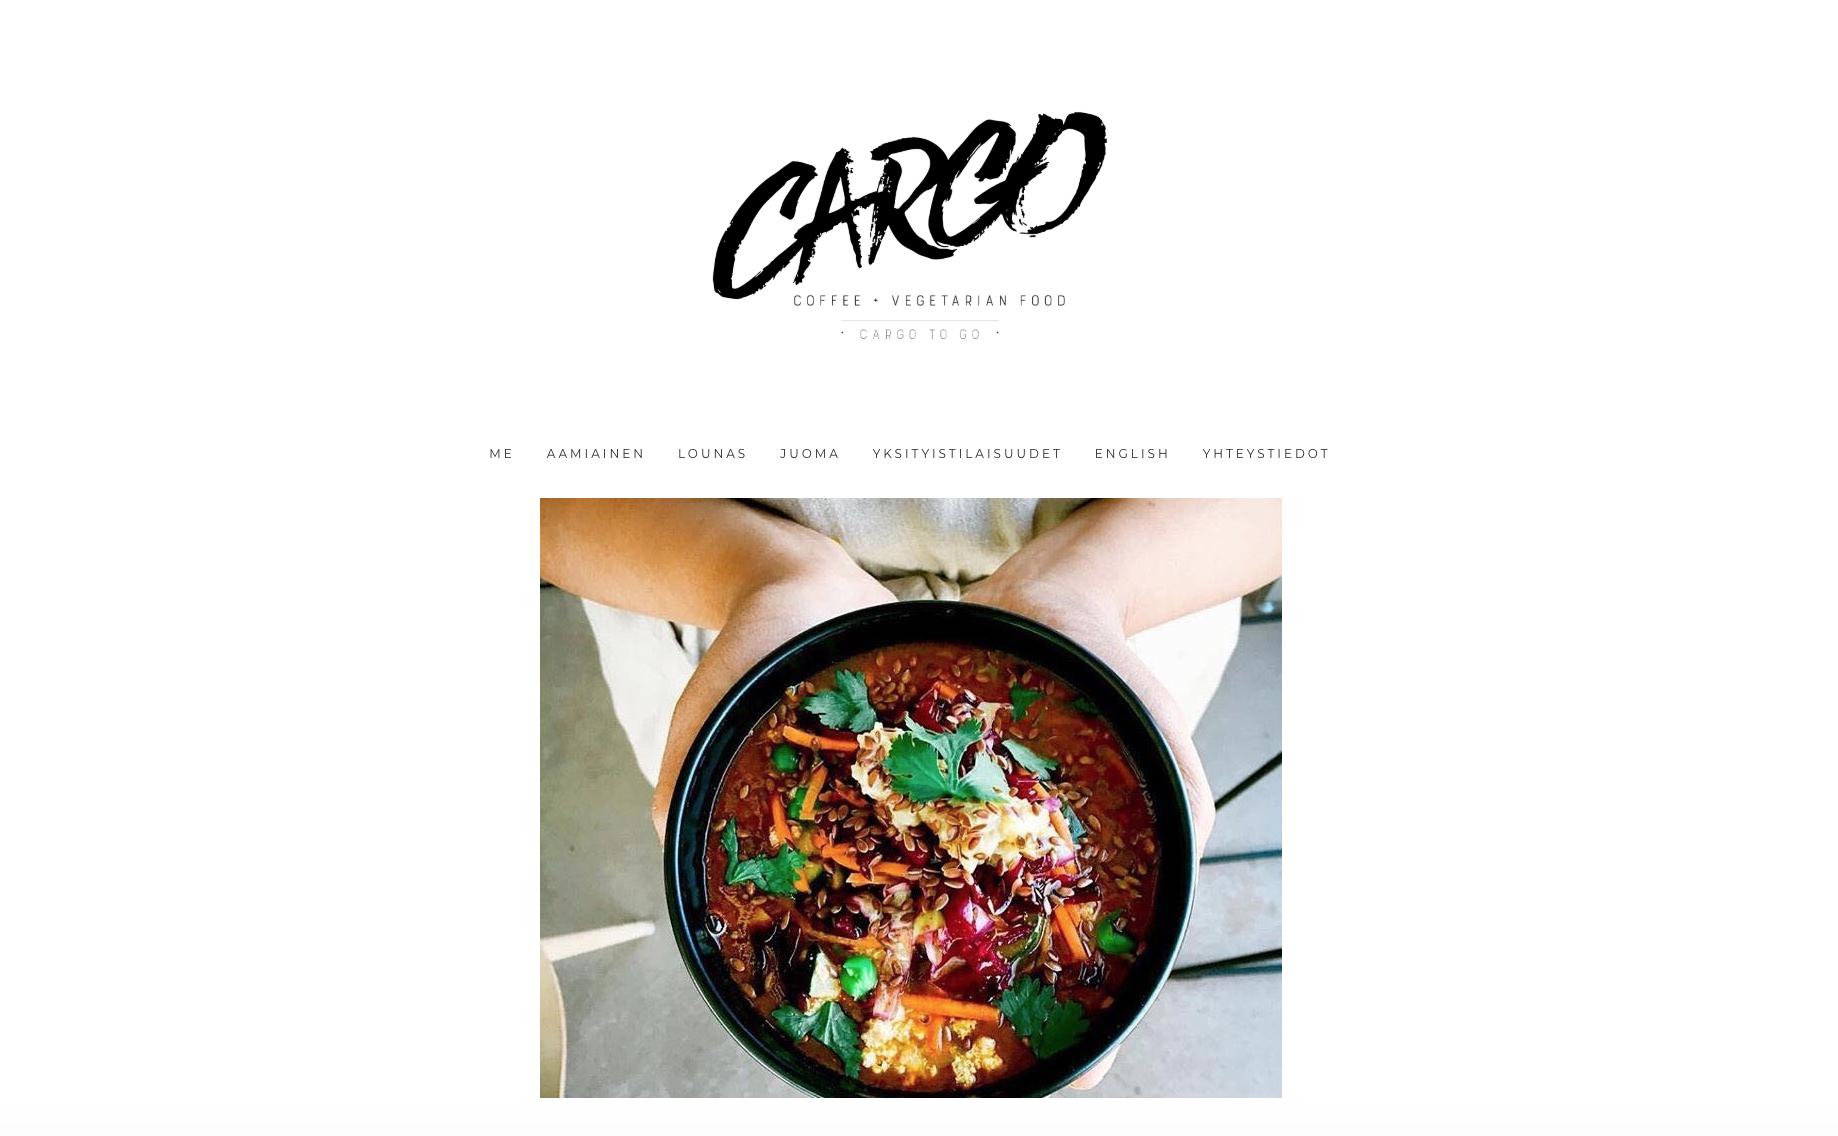 CARGO_fronts_III.png